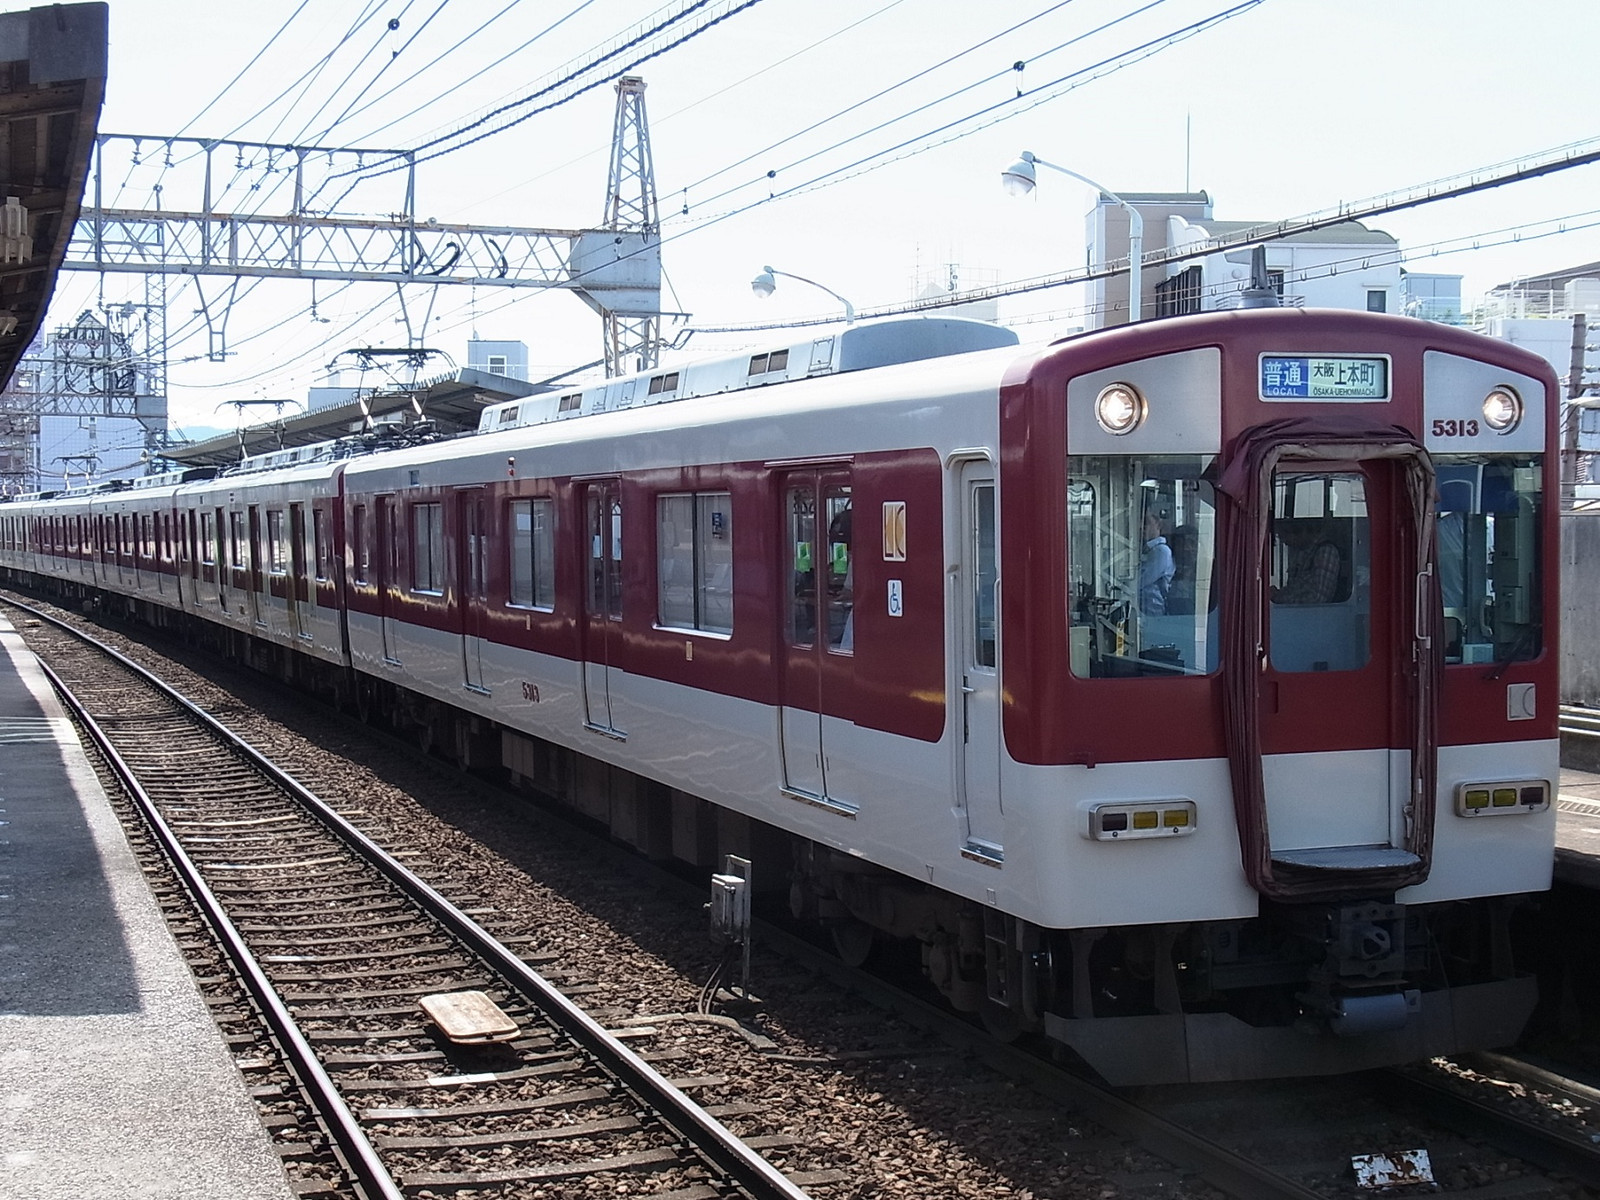 Rimg0268